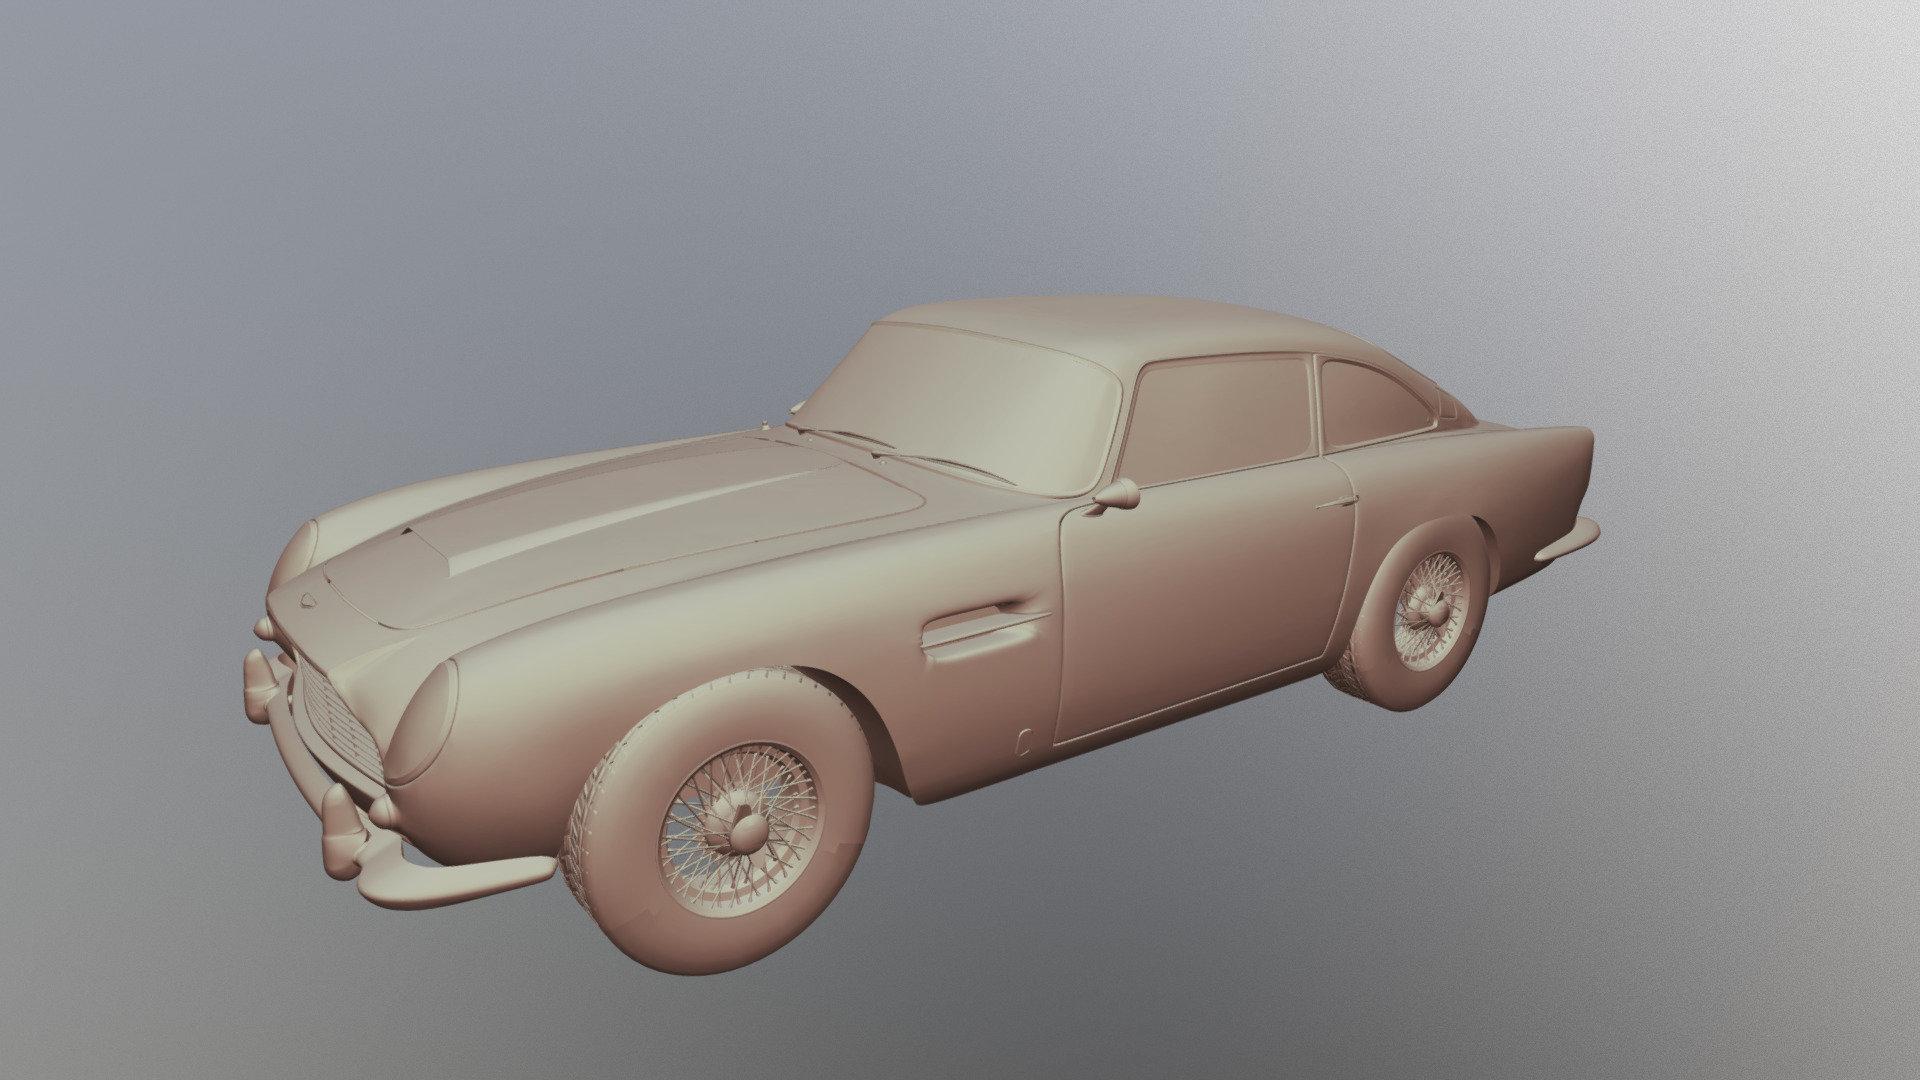 Aston Martin Db5 Download Free 3d Model By Jpo1703 Jpo1703 24de747